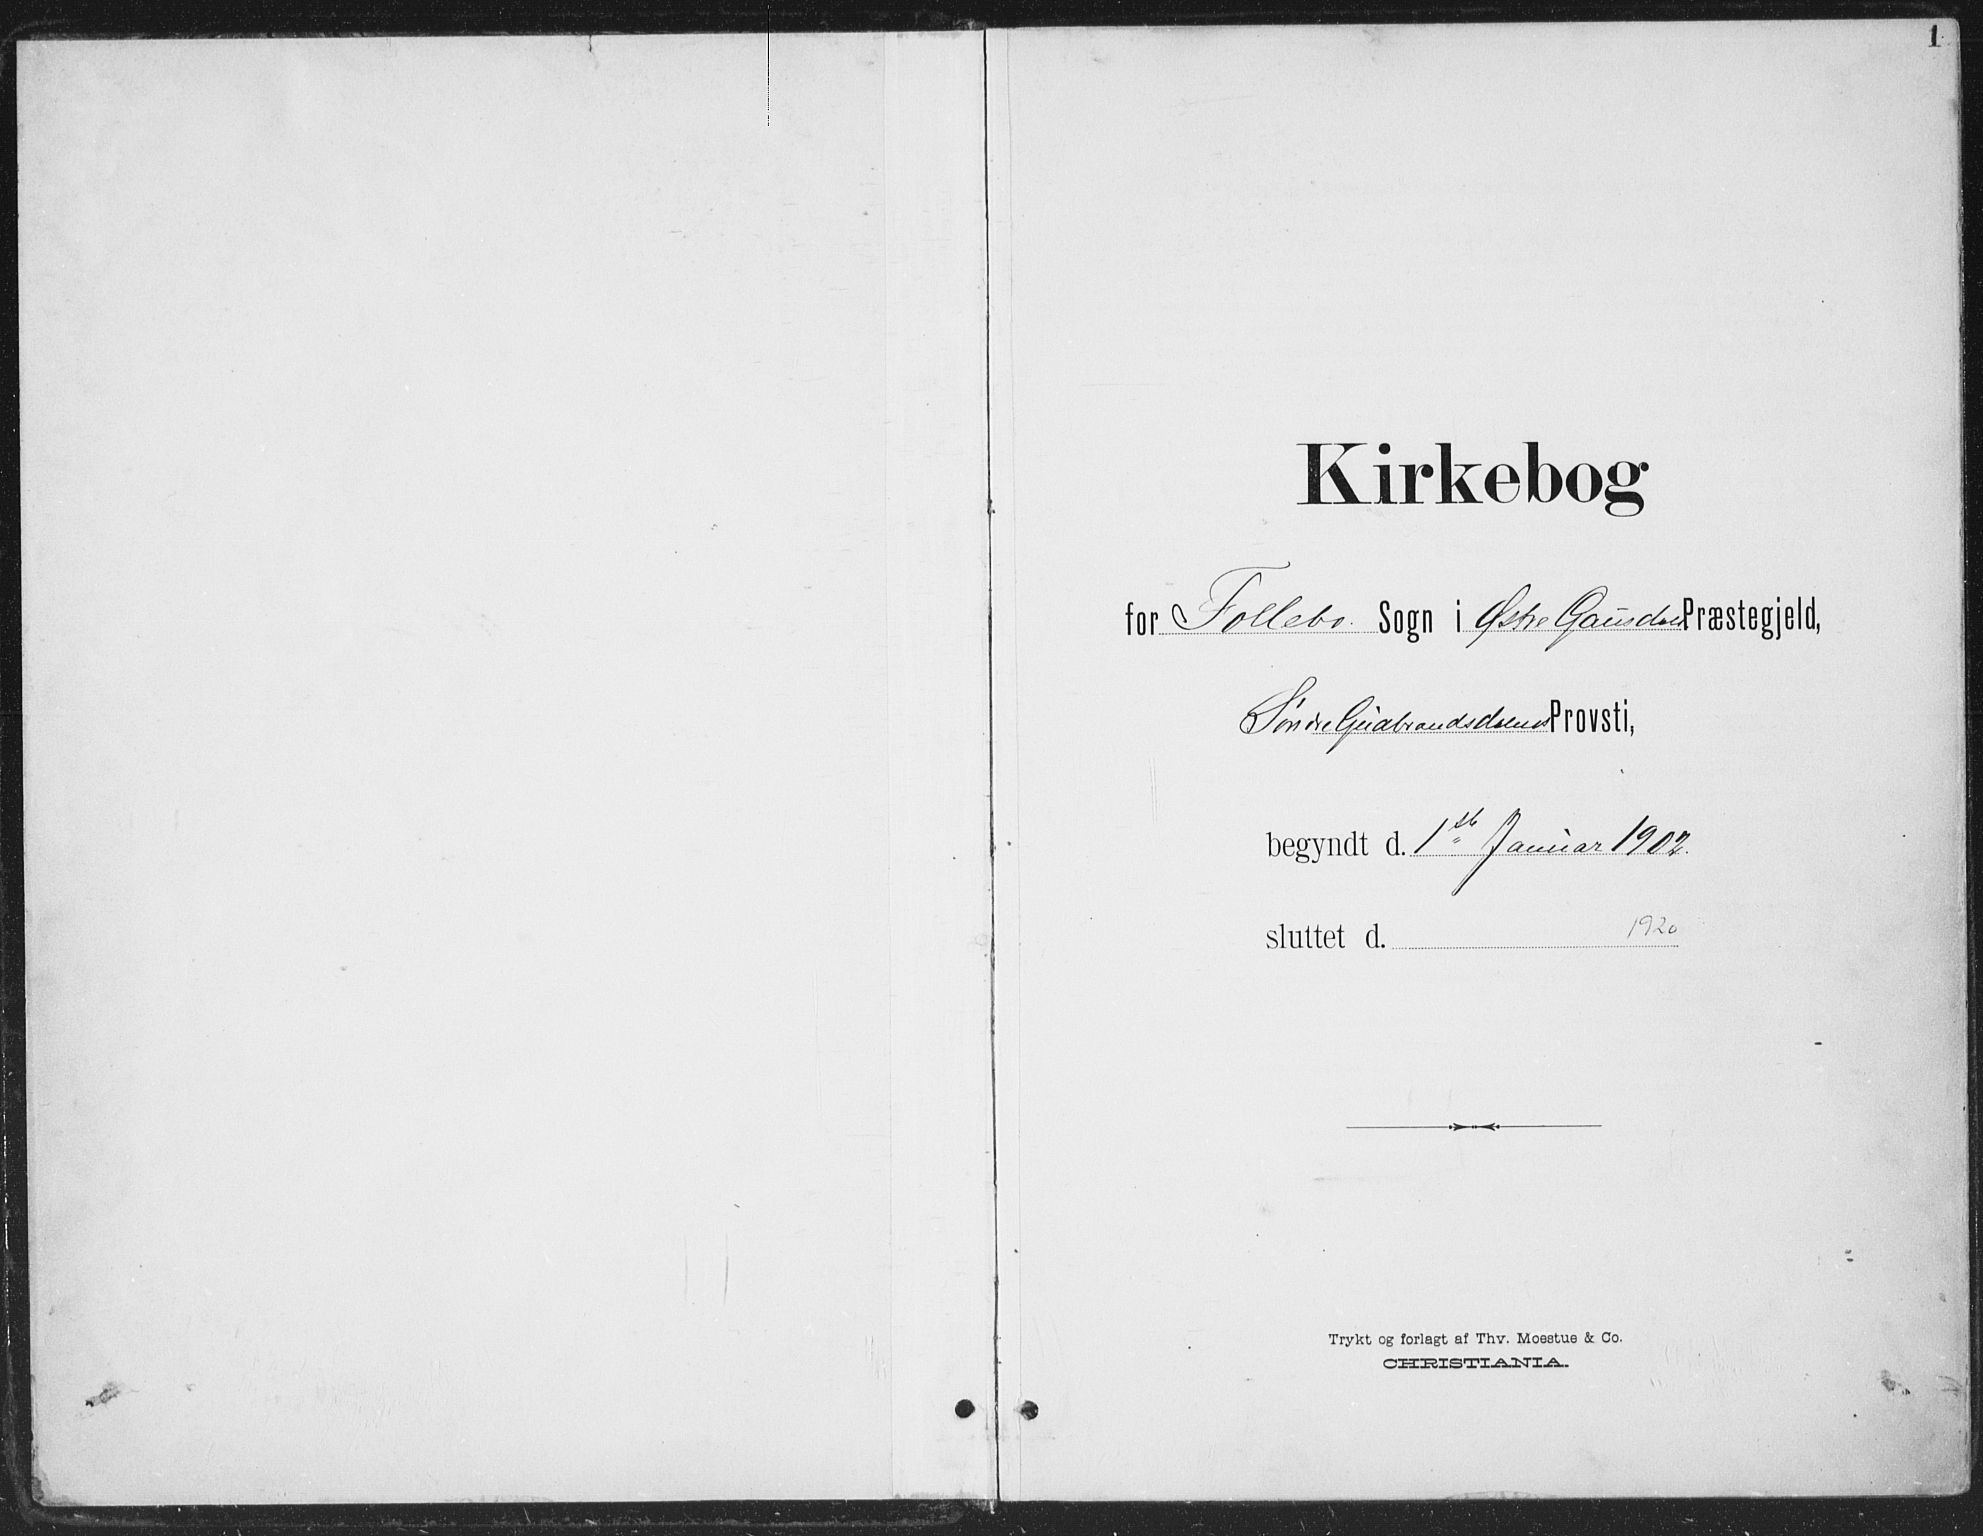 SAH, Østre Gausdal prestekontor, Ministerialbok nr. 5, 1902-1920, s. 1